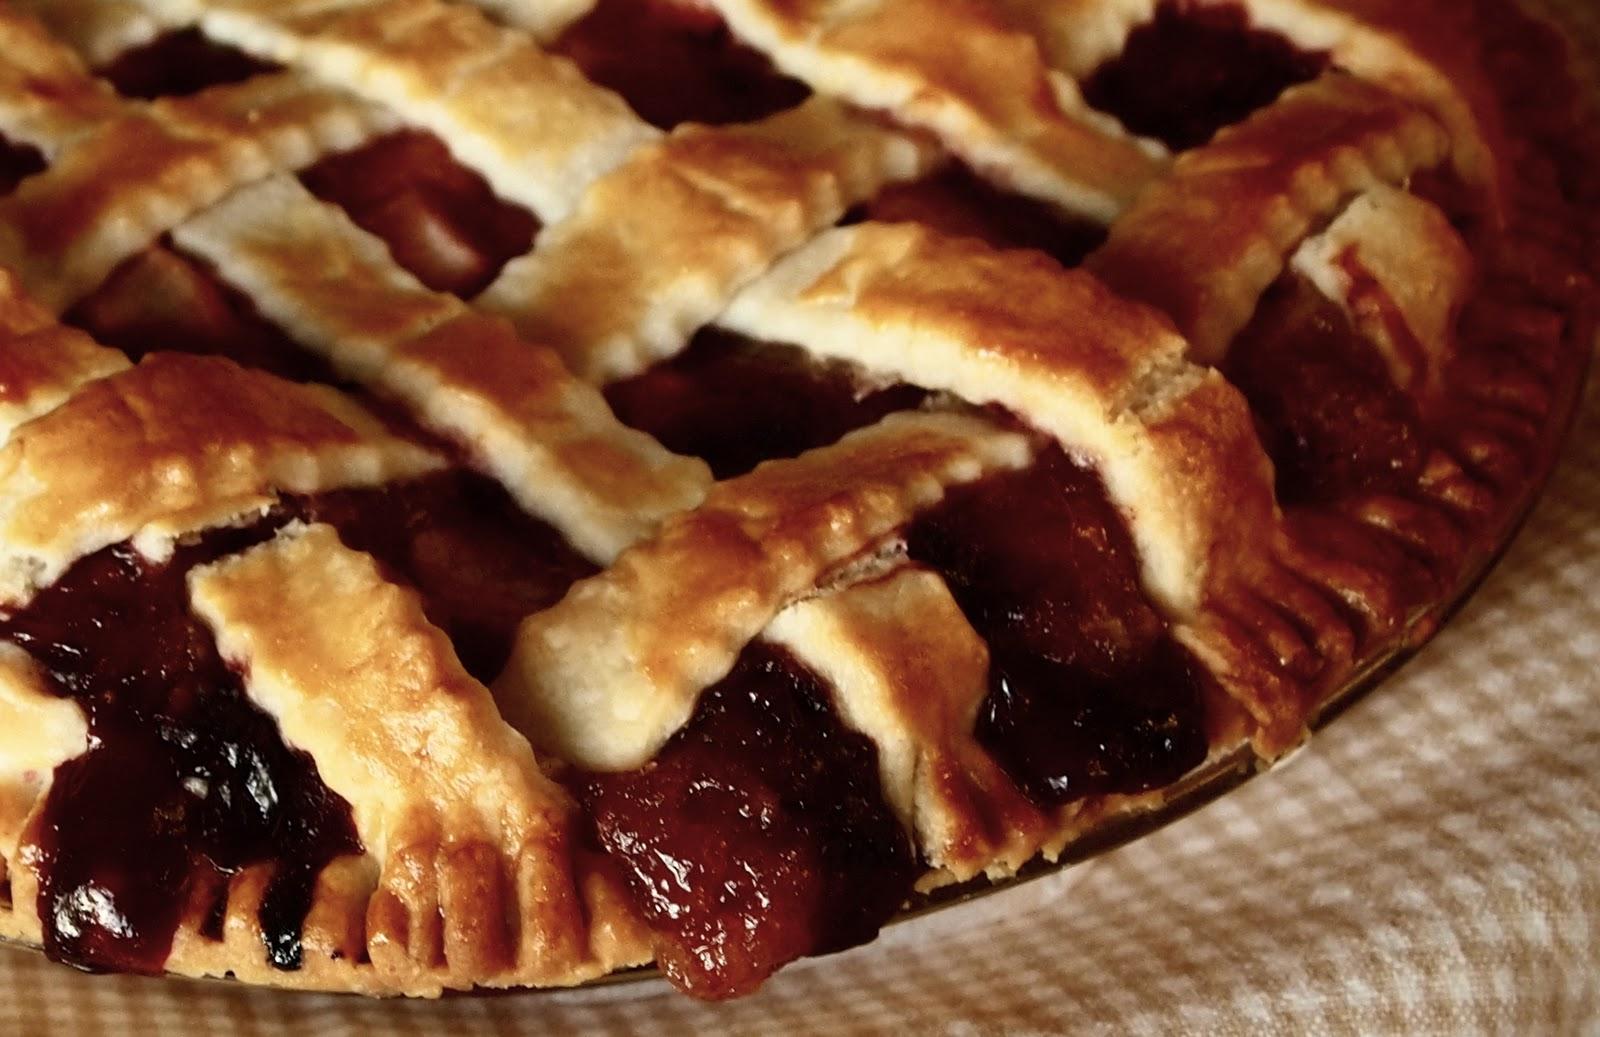 Blueberry Pie Recipe From Pillsbury Apple Blackberry Pie The Spiffy